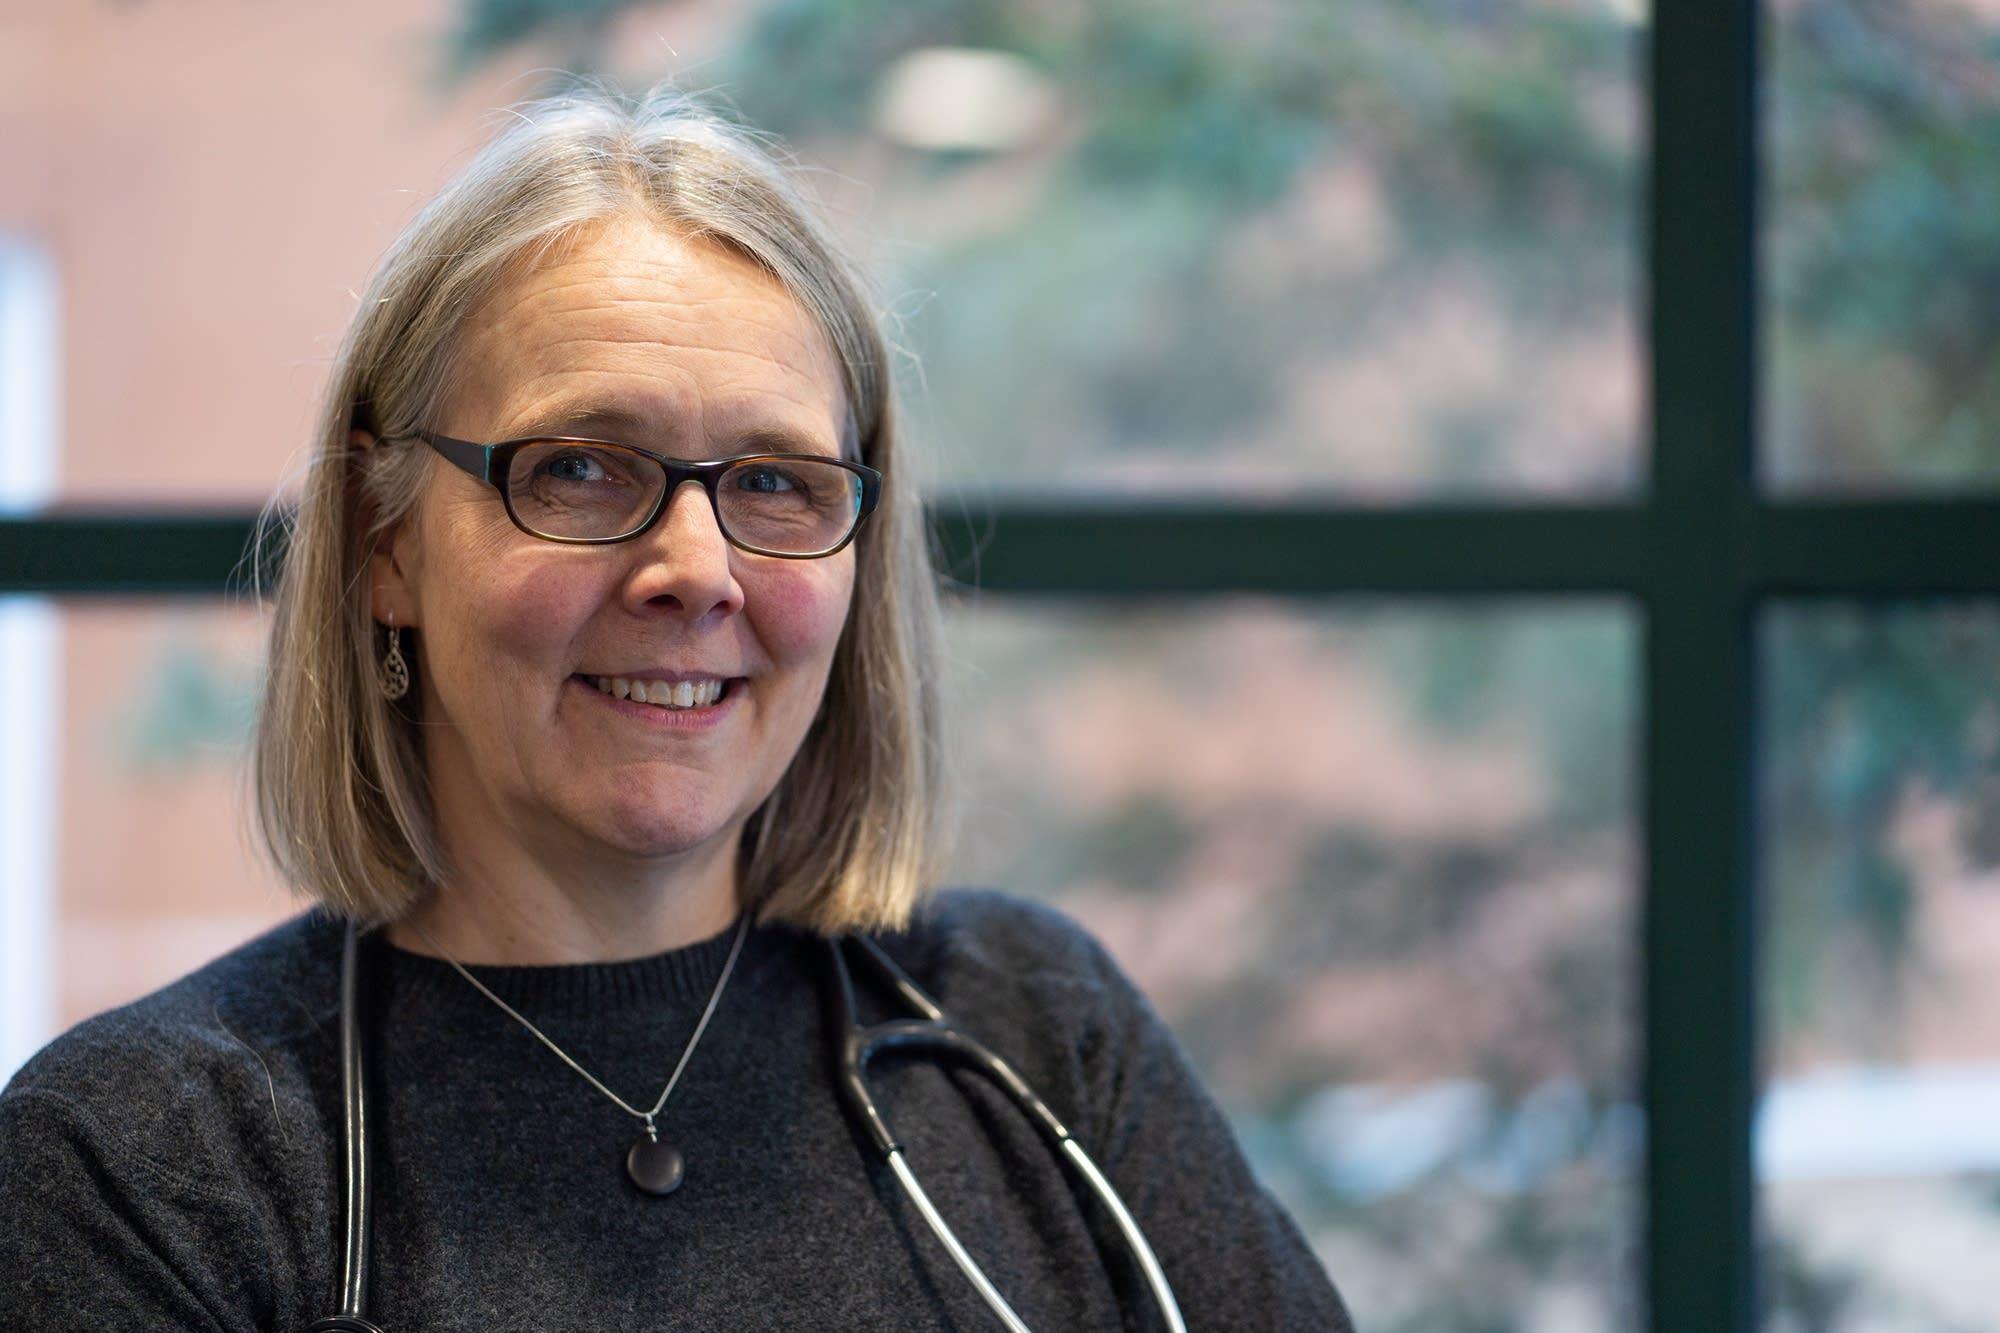 Dr. Jenny Delfs